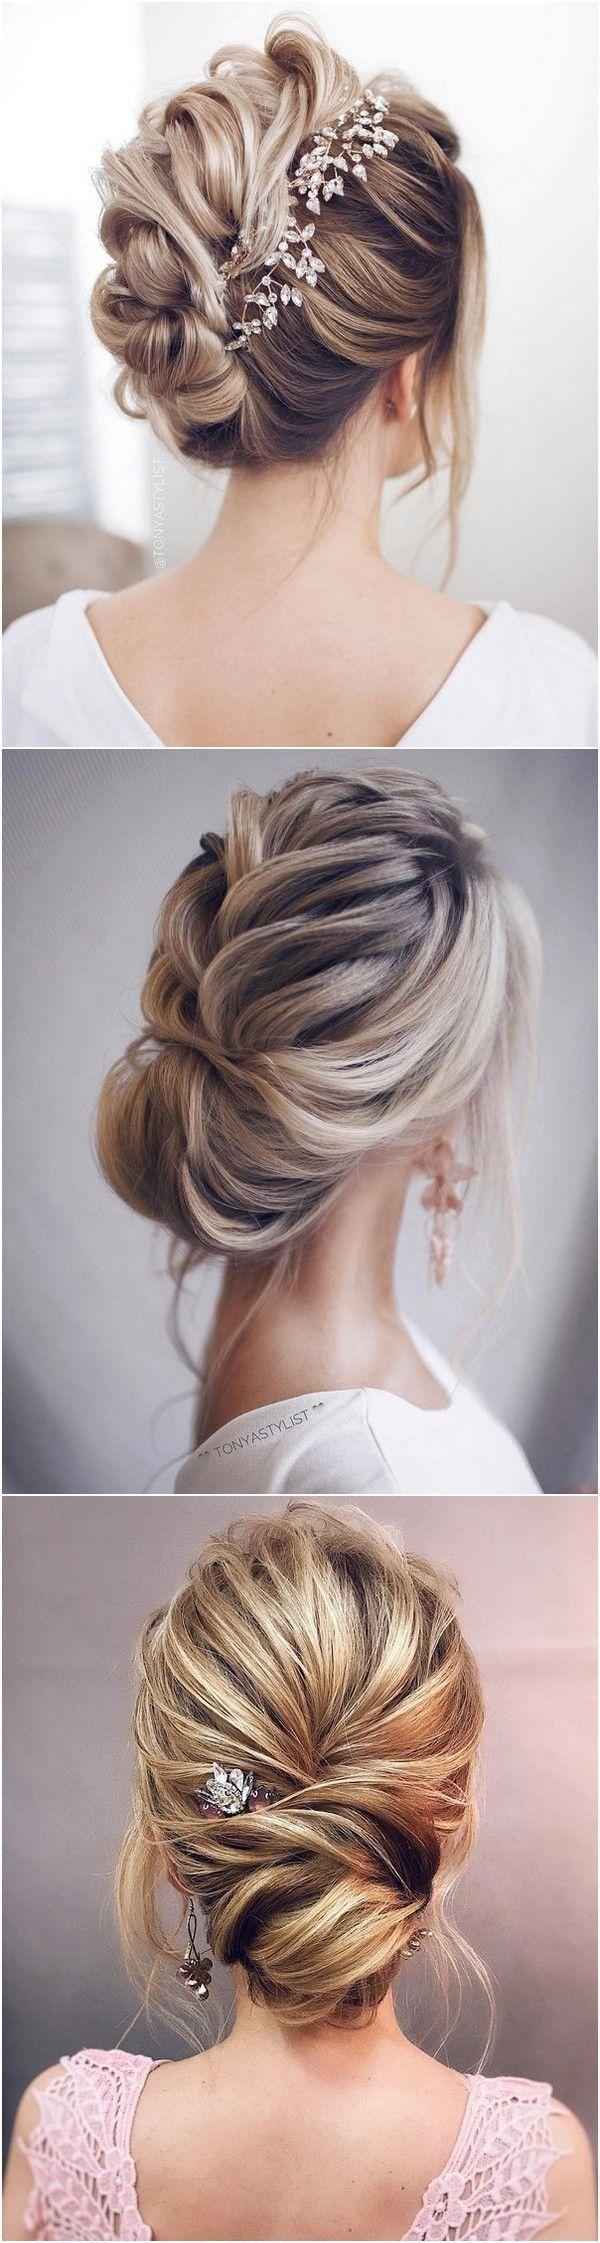 Elegant updo wedding hairstyles wedding hairstyles